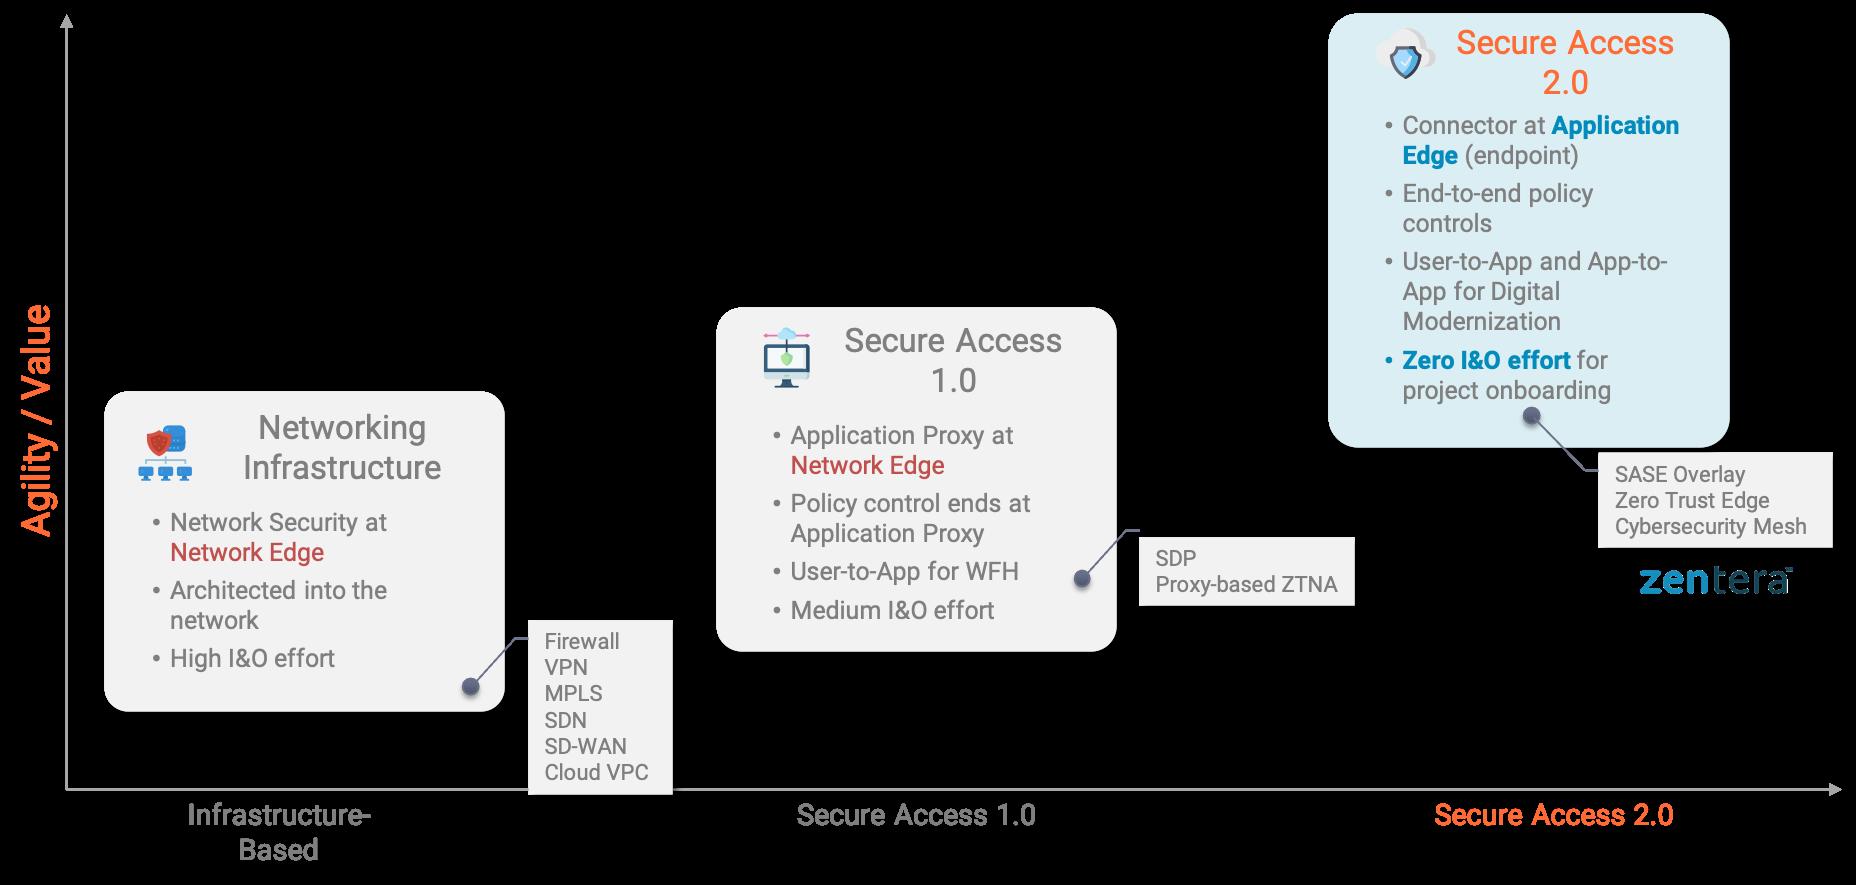 Secure Access 2.0 Graph